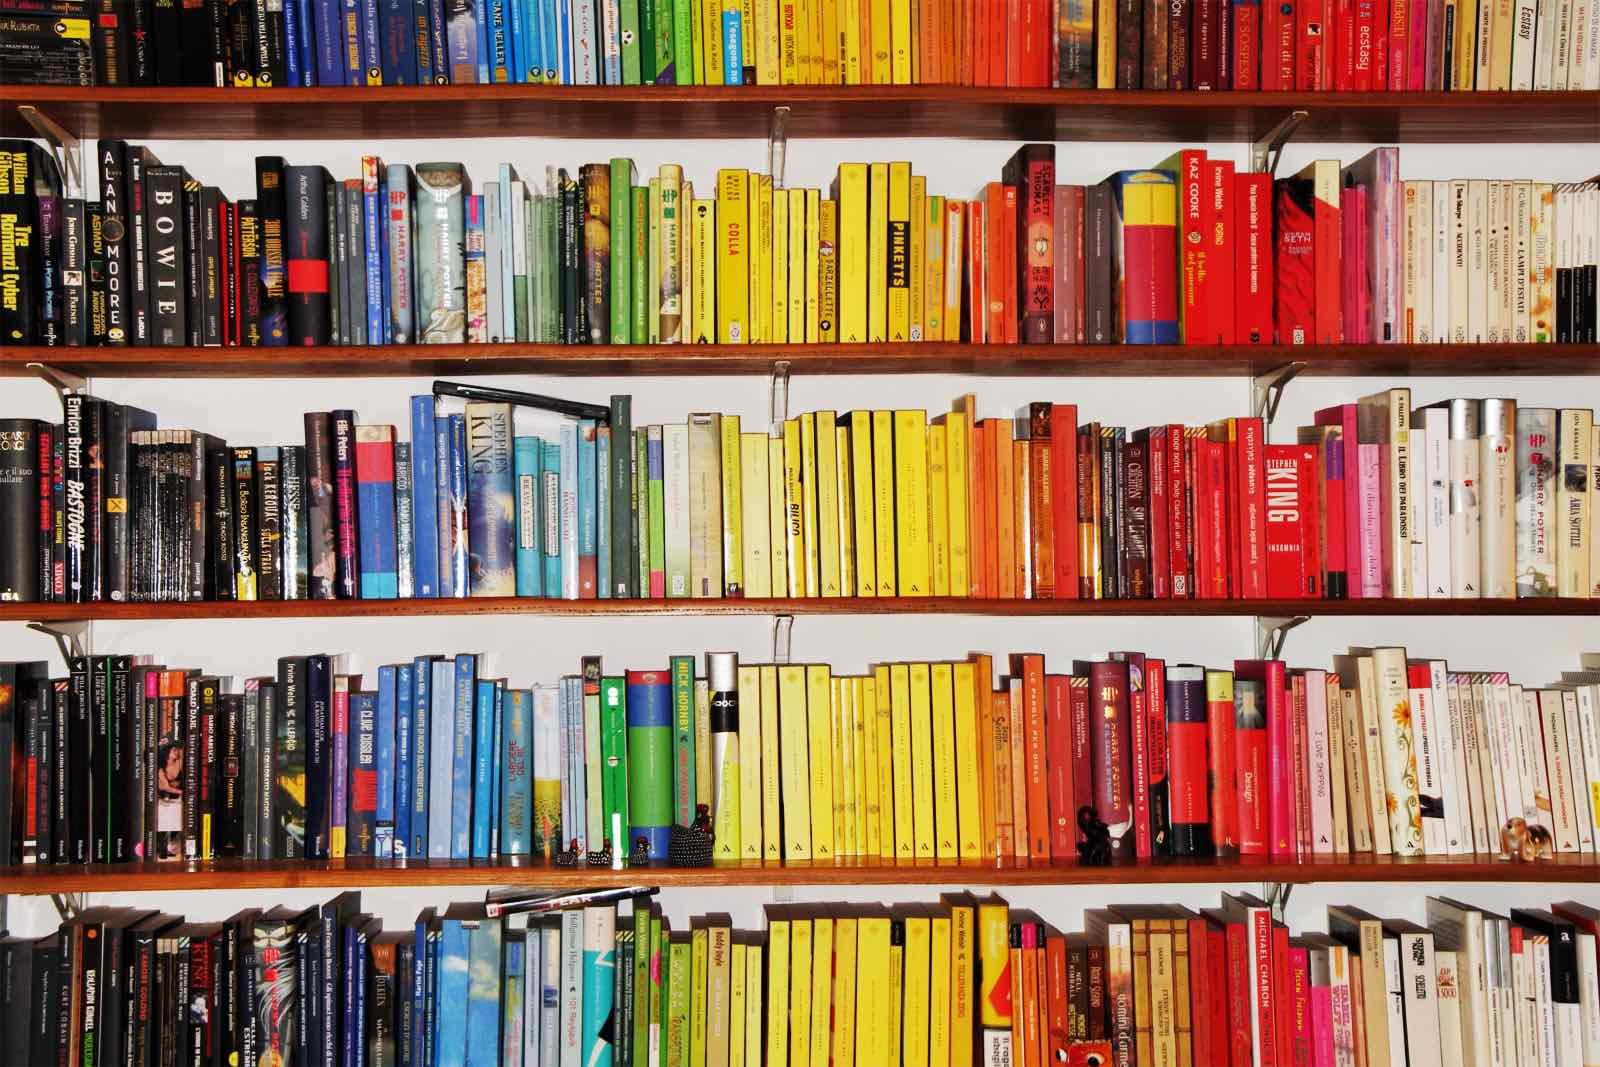 Co colour coordinated bookshelf - Co colour coordinated bookshelf 6